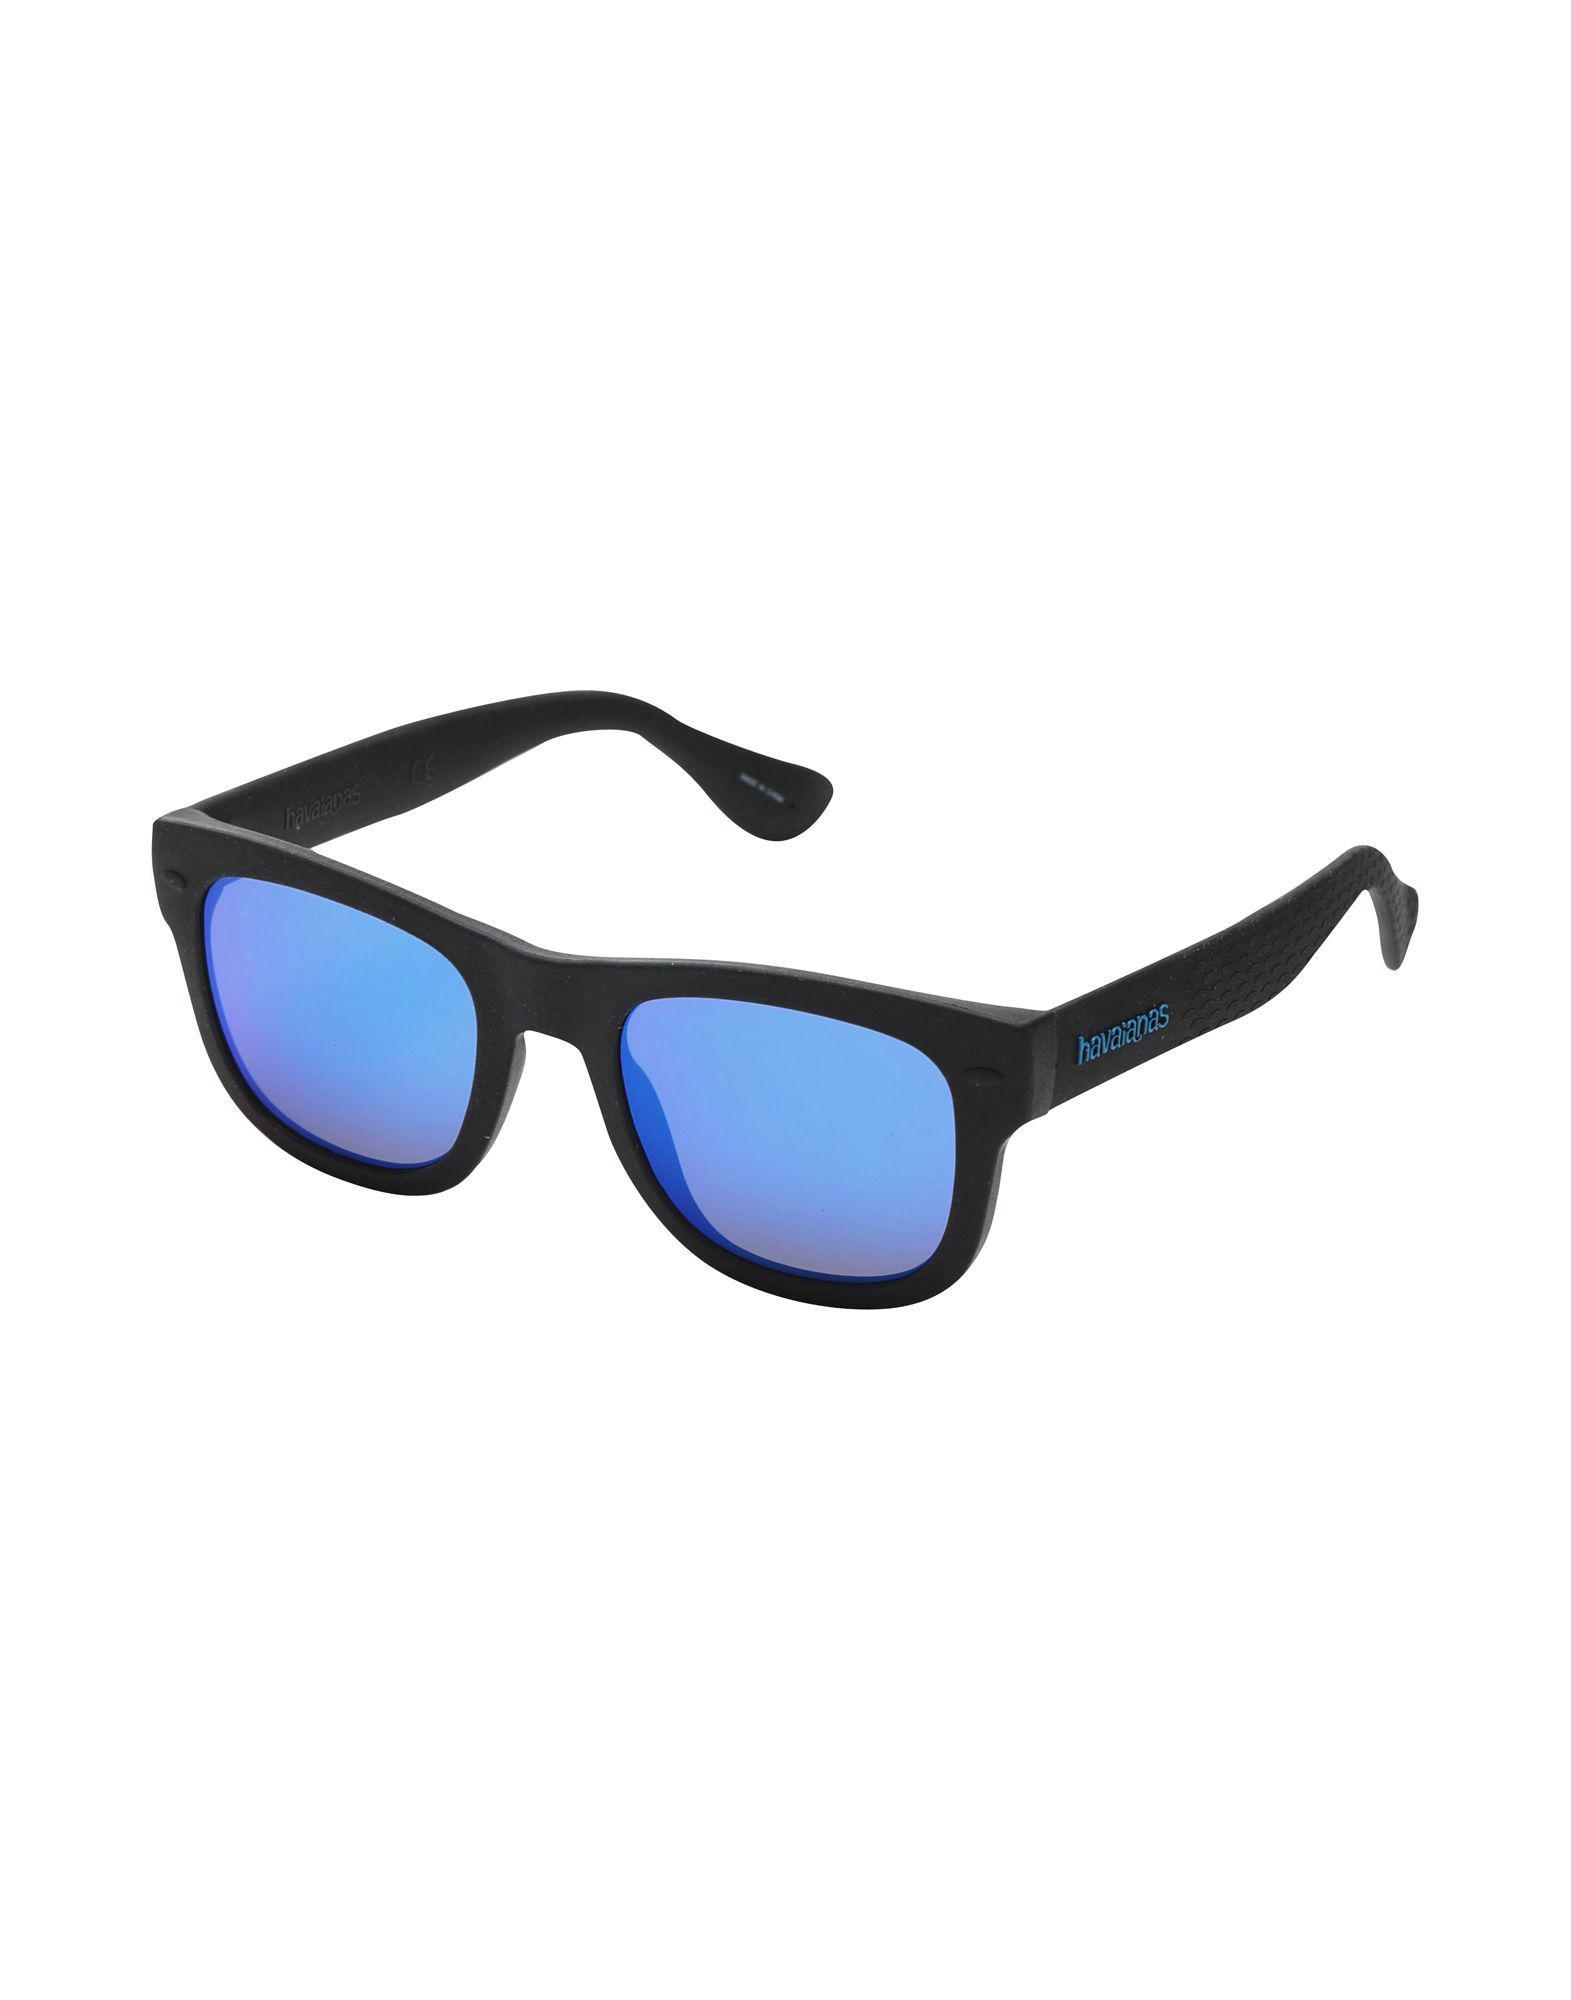 1e509adb70e3 Havaianas - Black Sunglasses - Lyst. View fullscreen